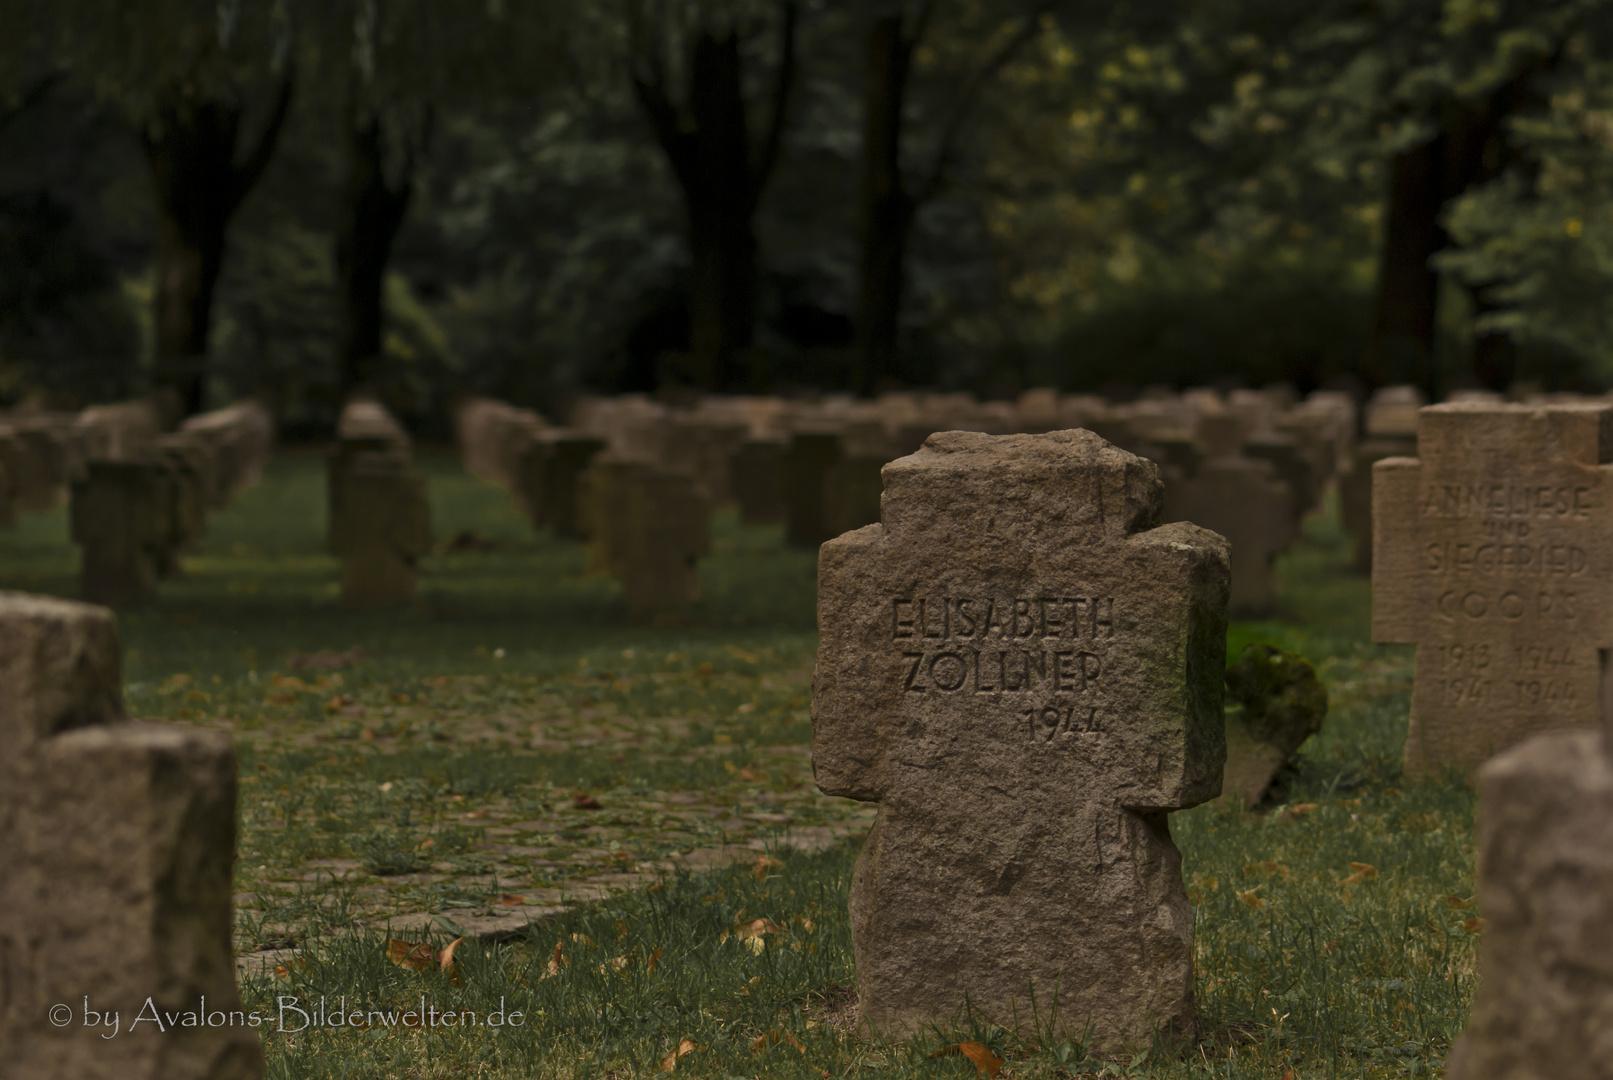 Sinnlos - Hauptfriedhof Dortmund VIII